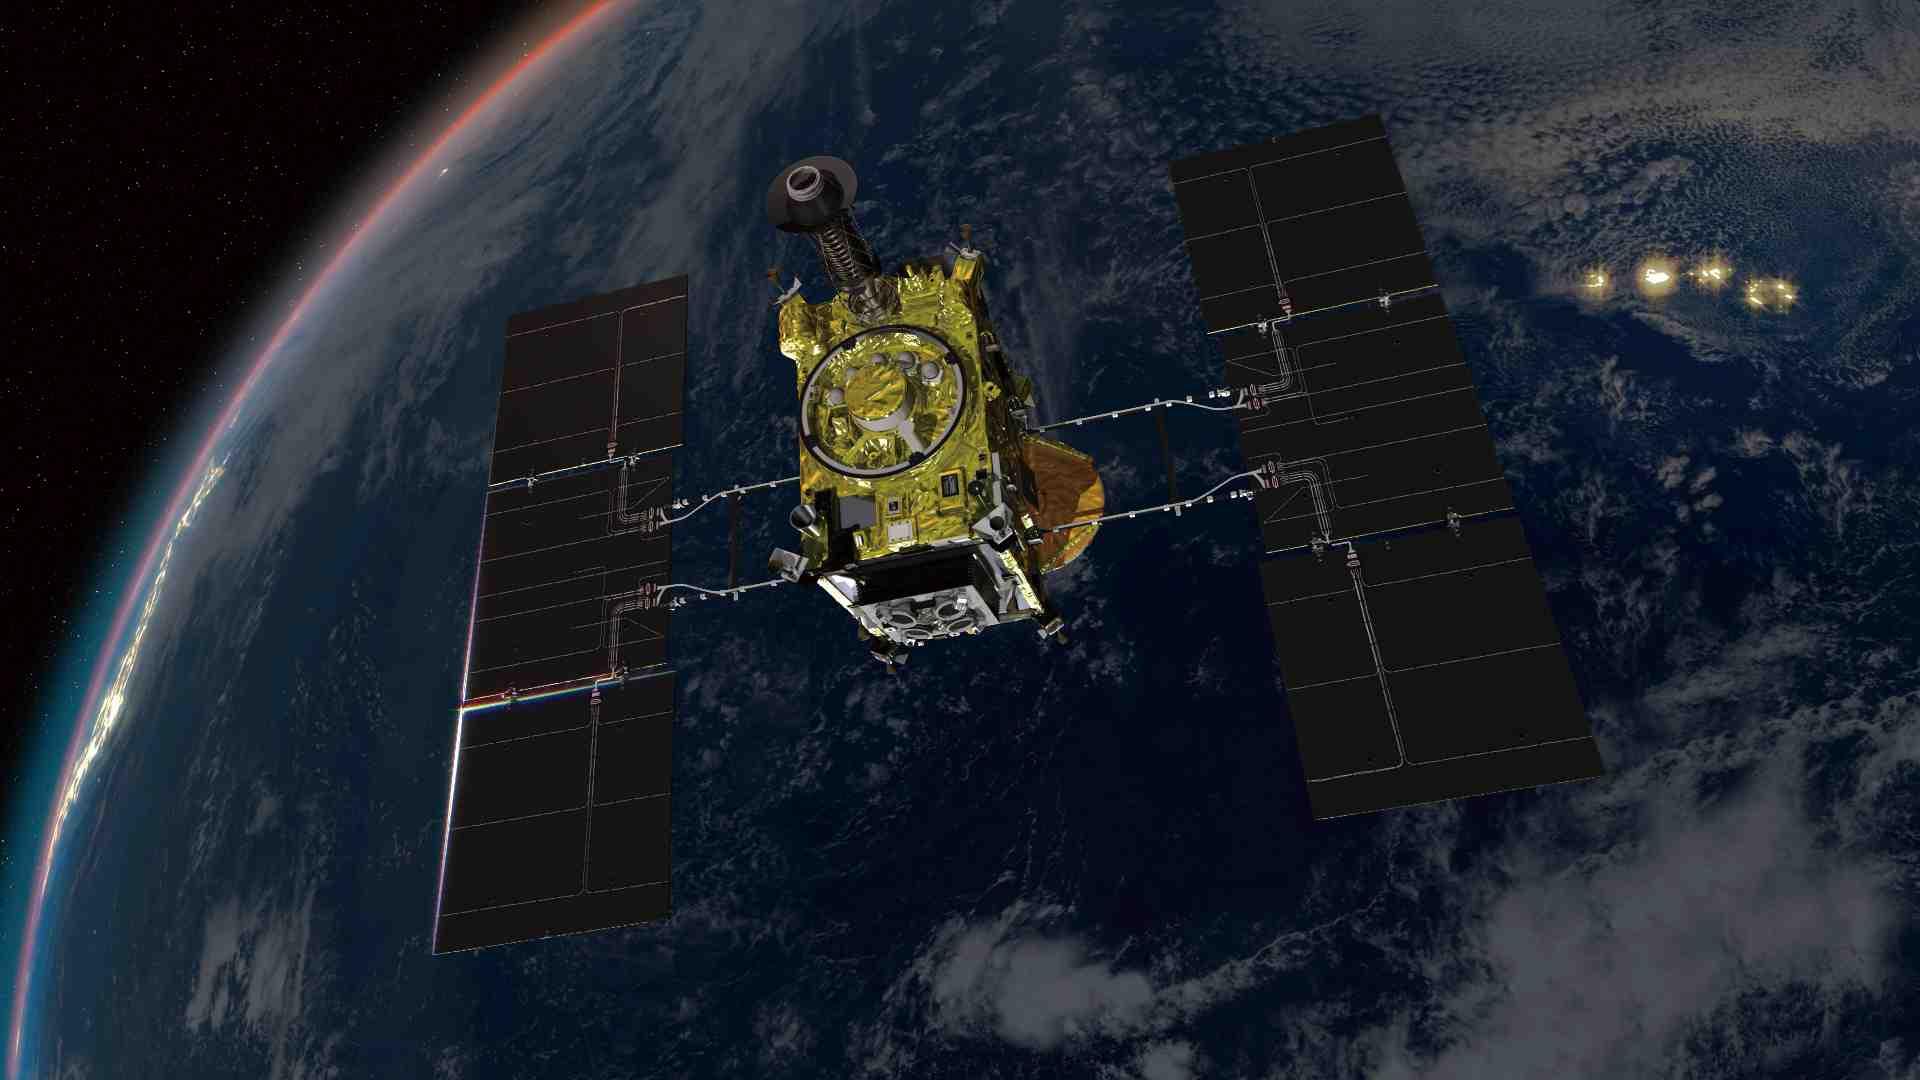 JAXA Space Probe Hayabusa2 002